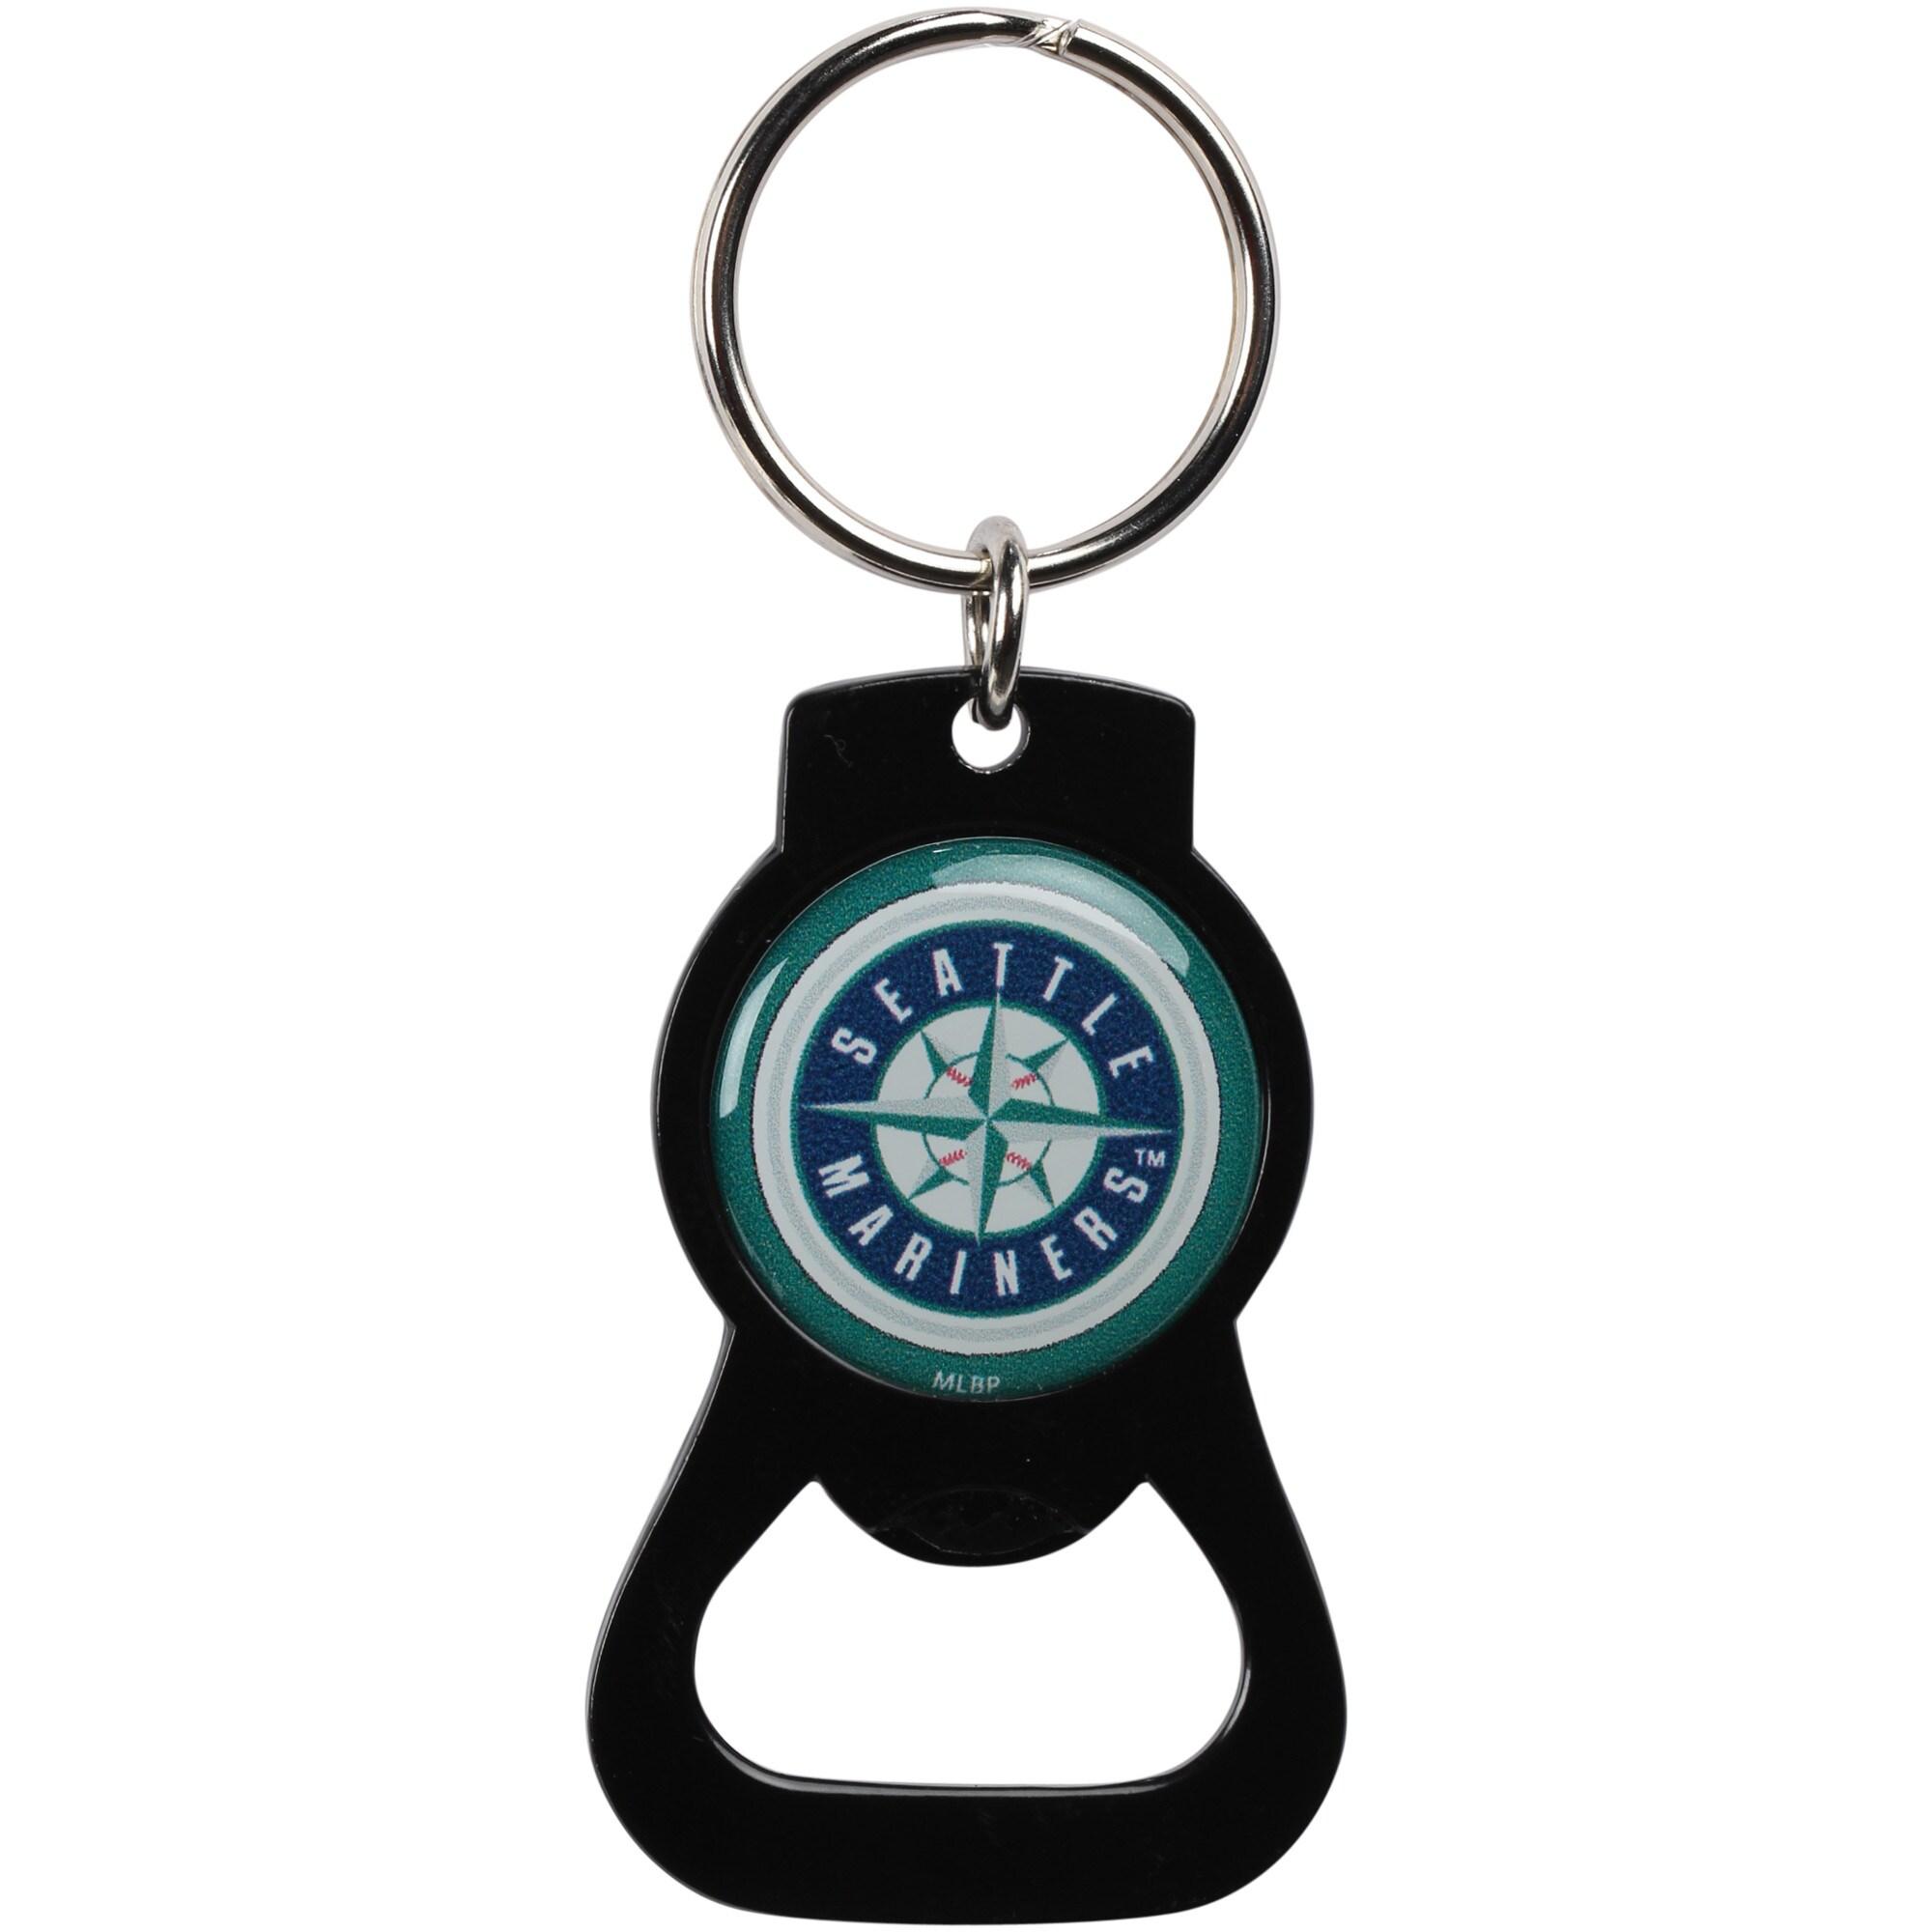 Seattle Mariners Bottle Opener Keychain - Black